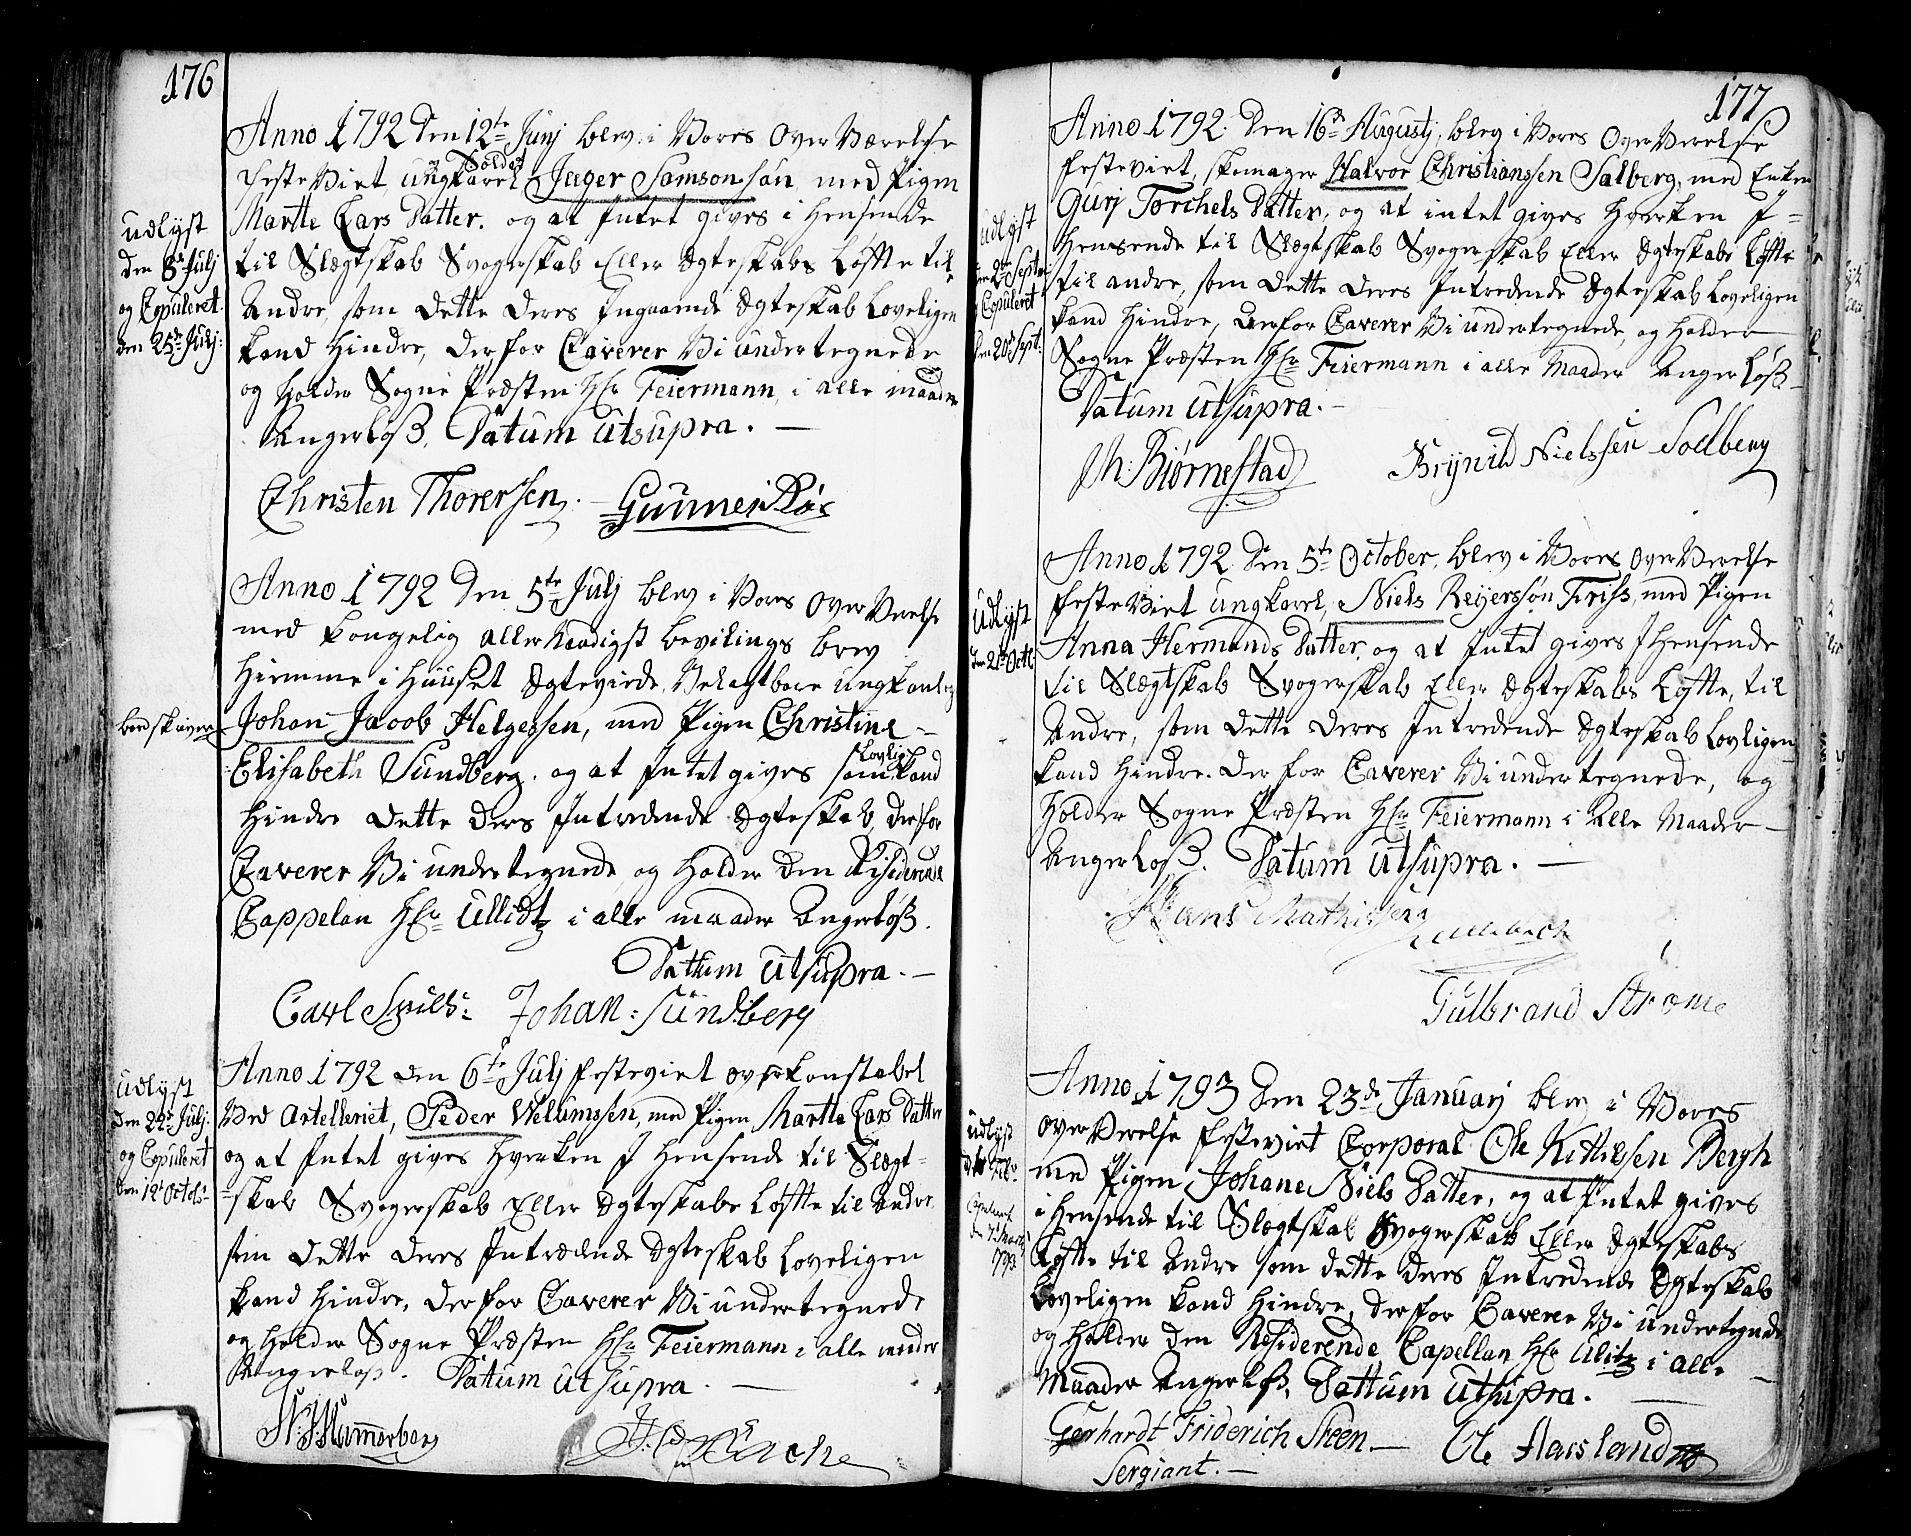 SAO, Fredrikstad prestekontor Kirkebøker, F/Fa/L0002: Ministerialbok nr. 2, 1750-1804, s. 176-177